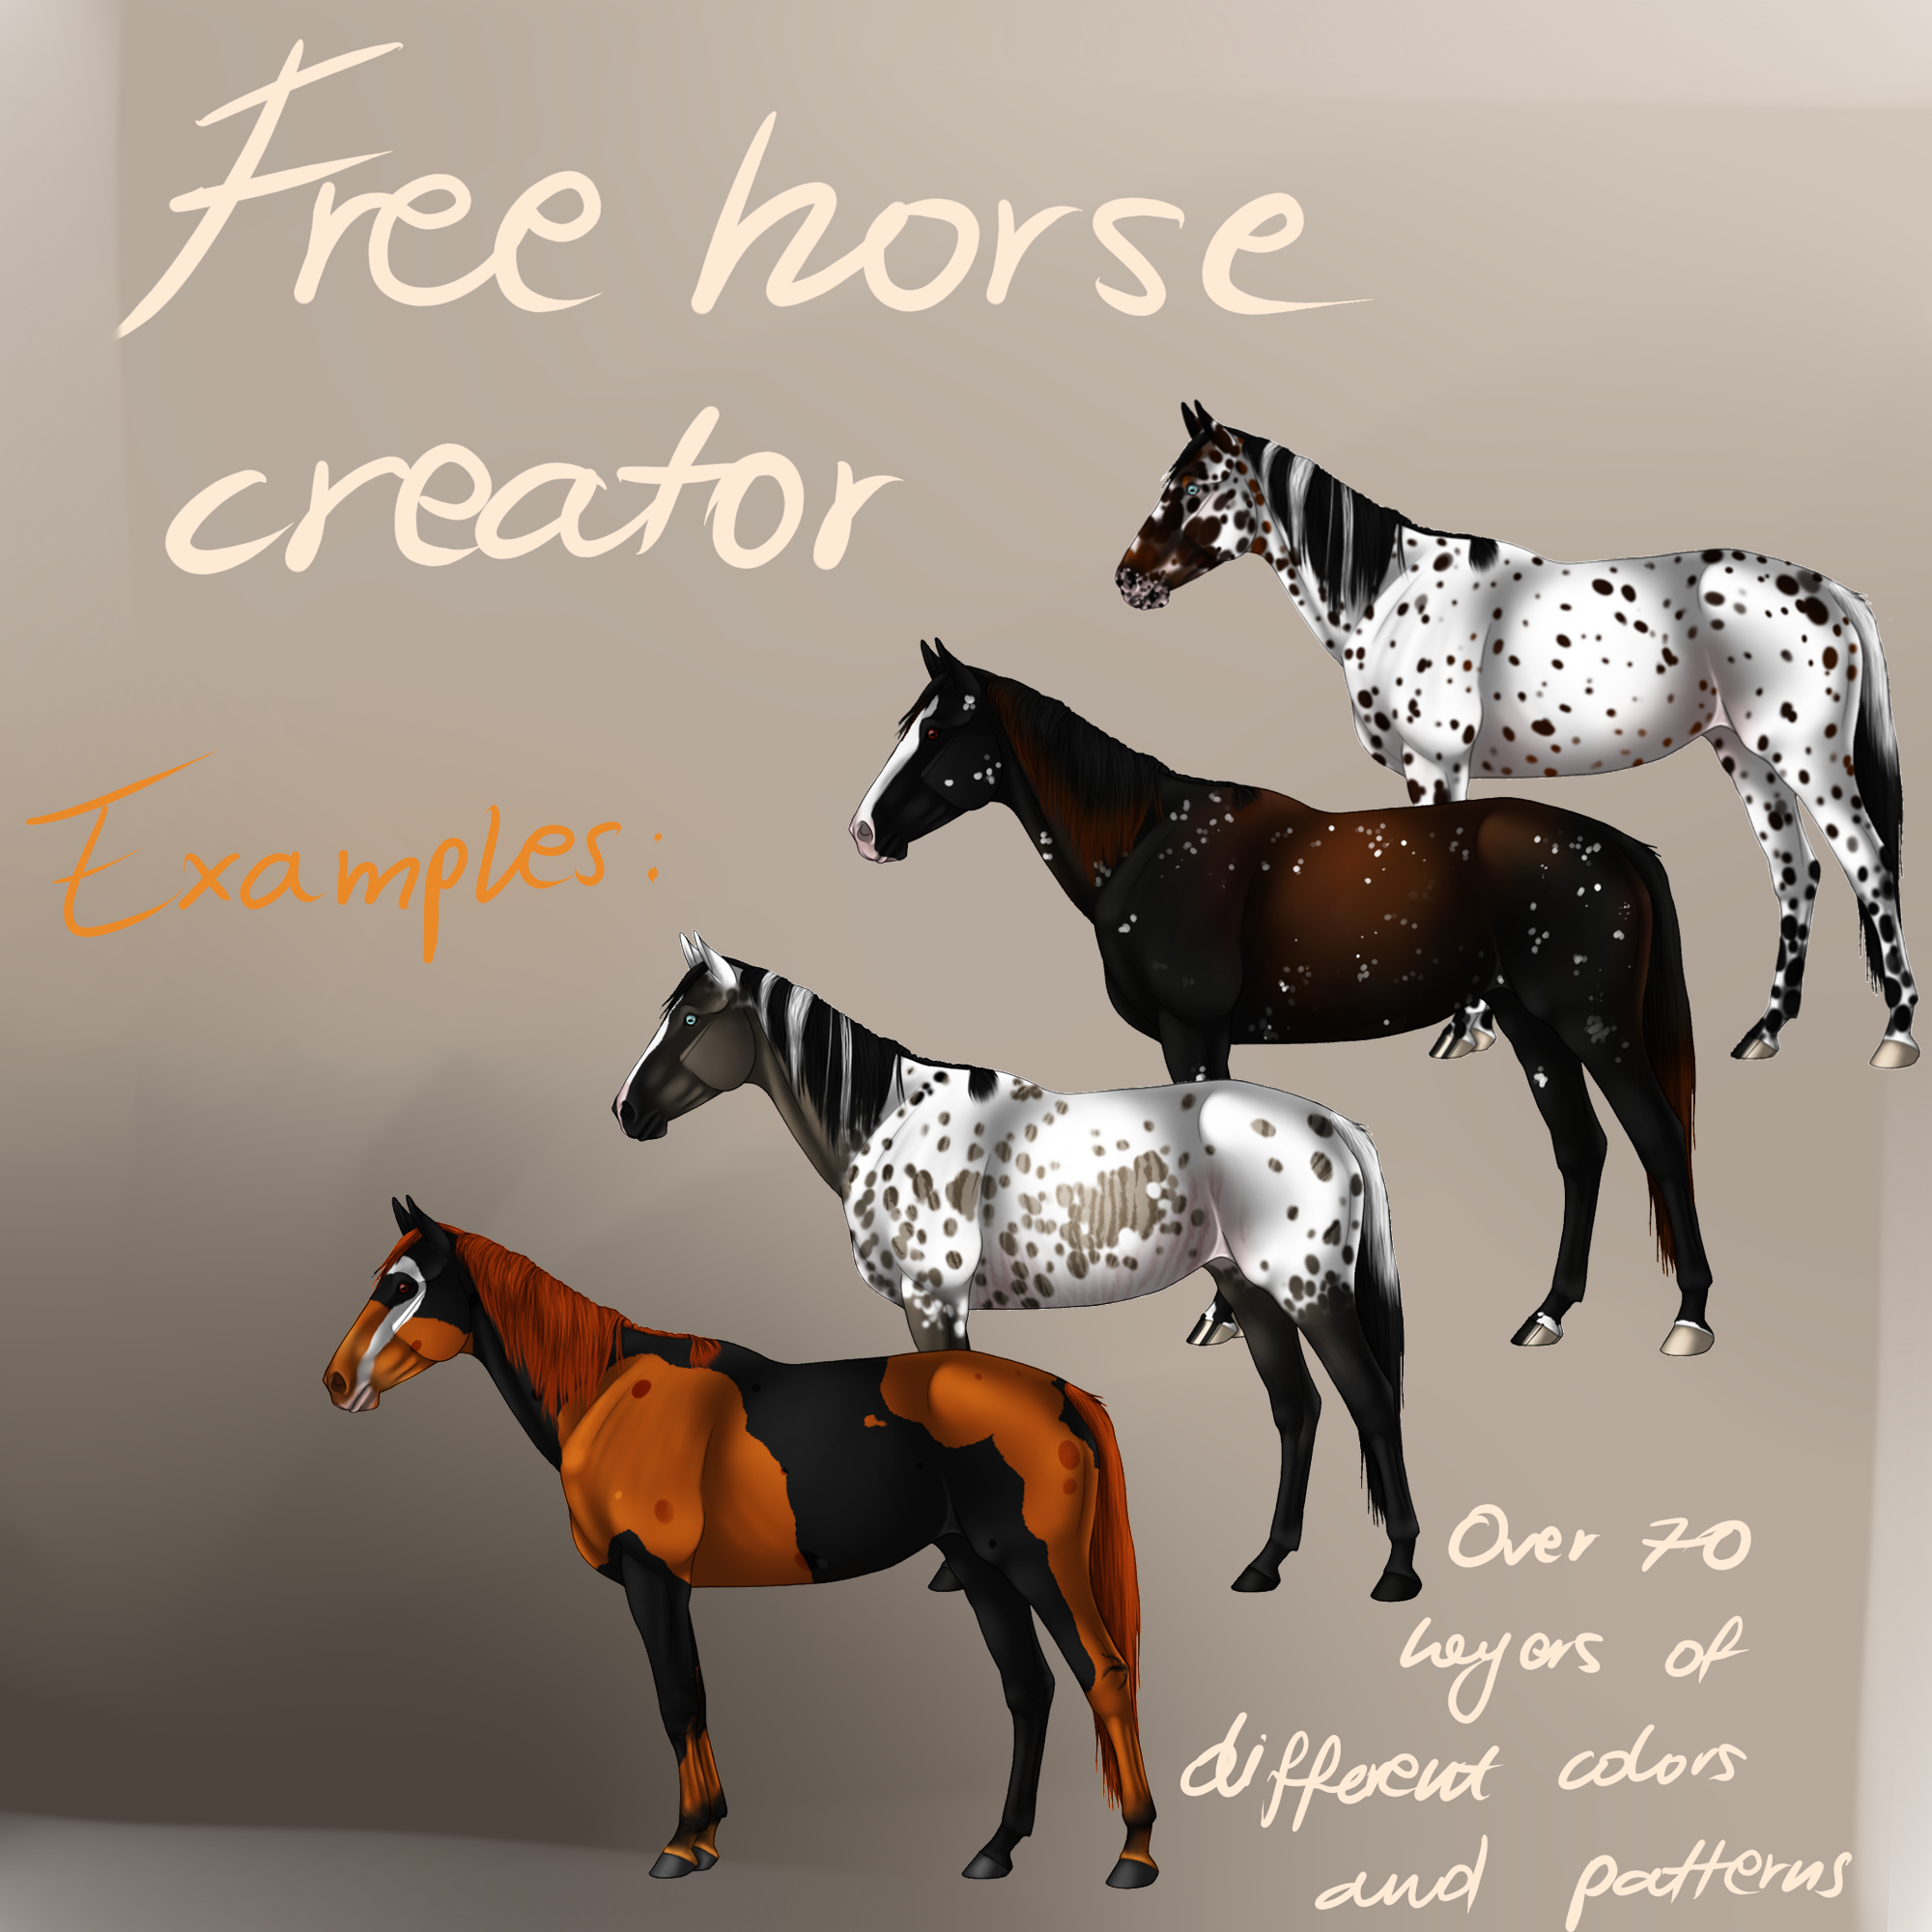 Free Horse Creator!